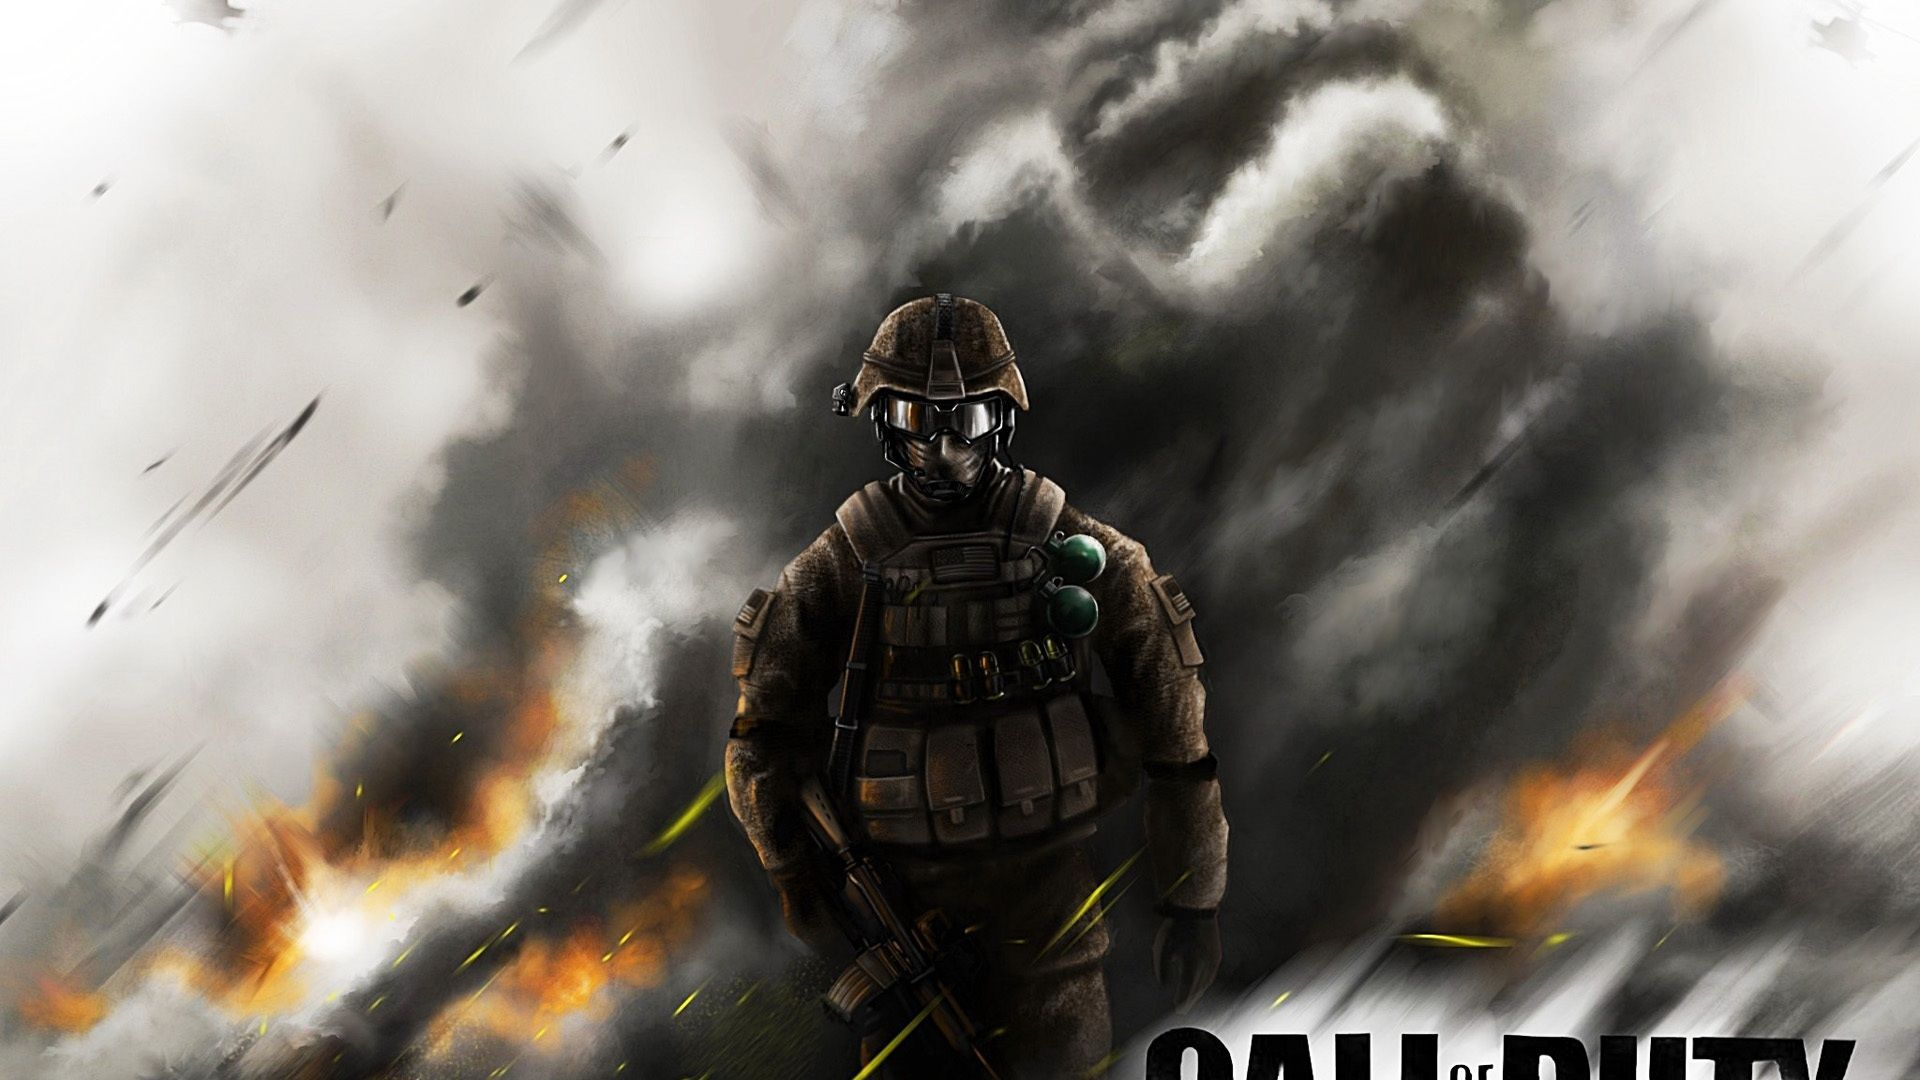 Mw Wallpaper Hd Modern Warfare Call Of Duty 8k Wallpaper